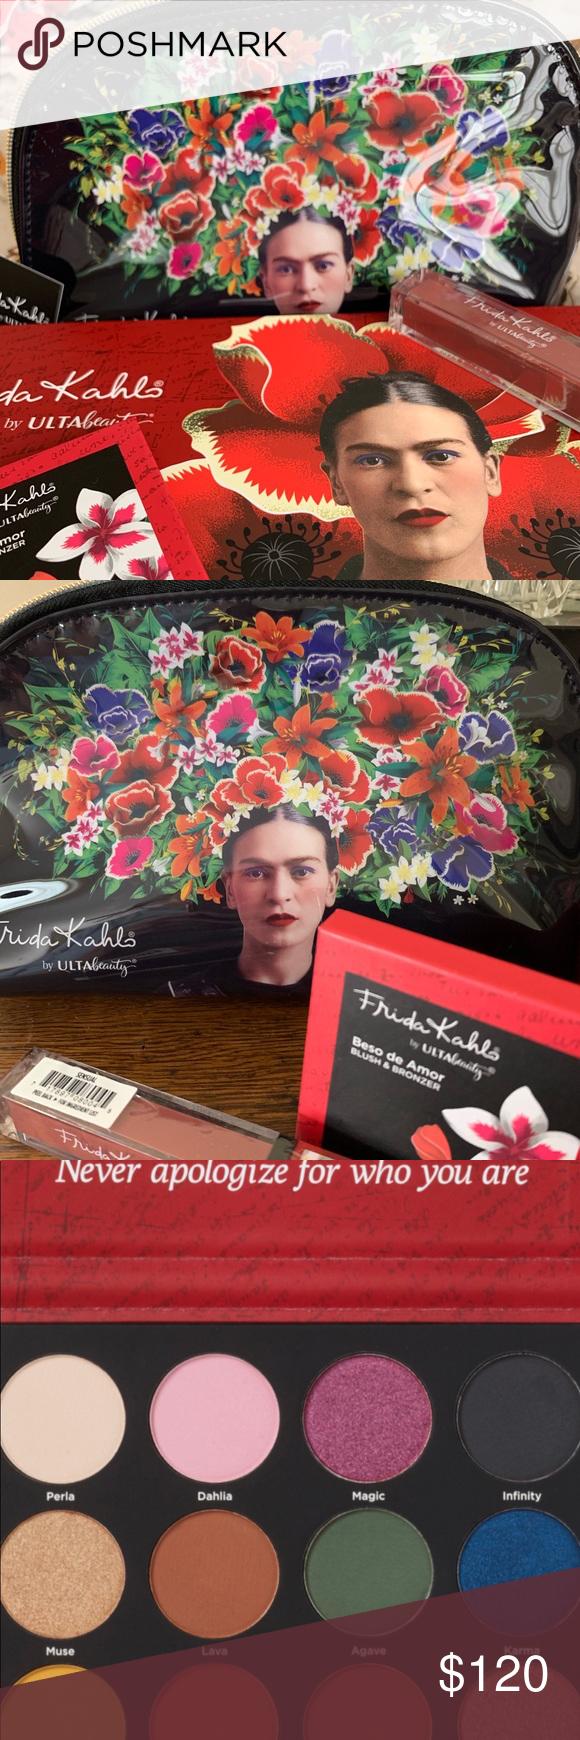 AMAZING Frida Kahlo Art Makeup Collection NEW NWT Makeup